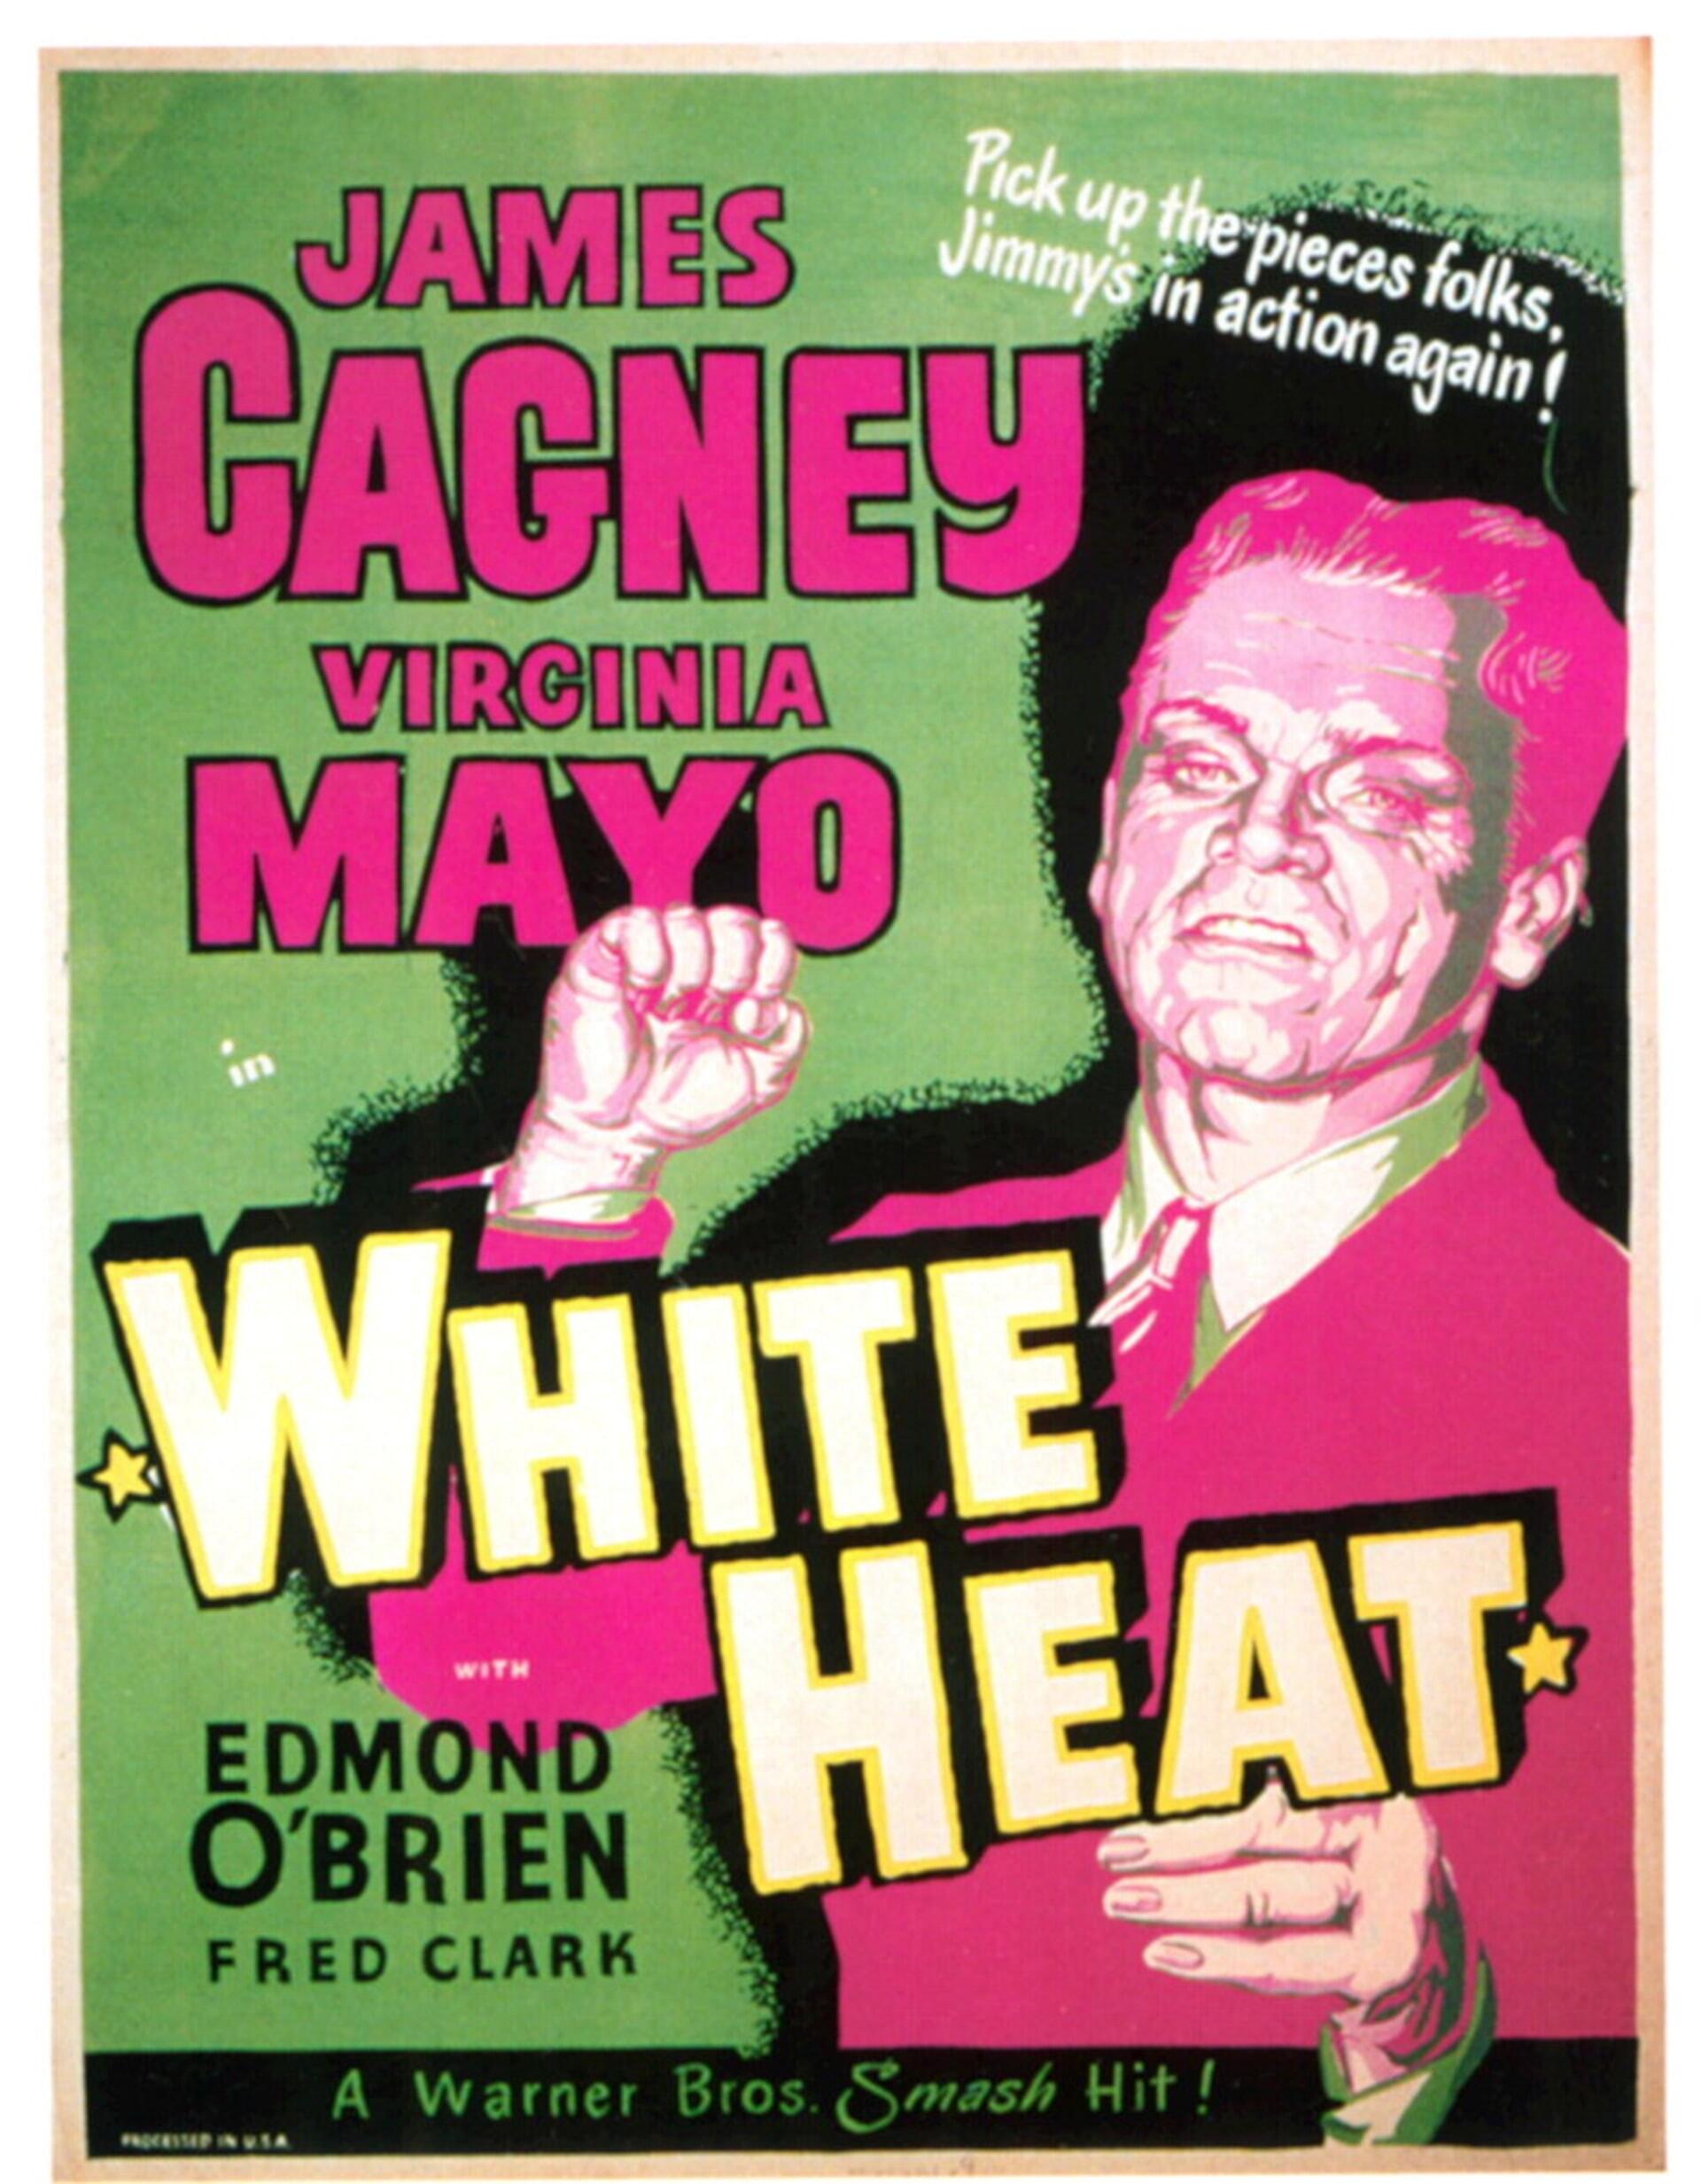 White Heat - Poster 2